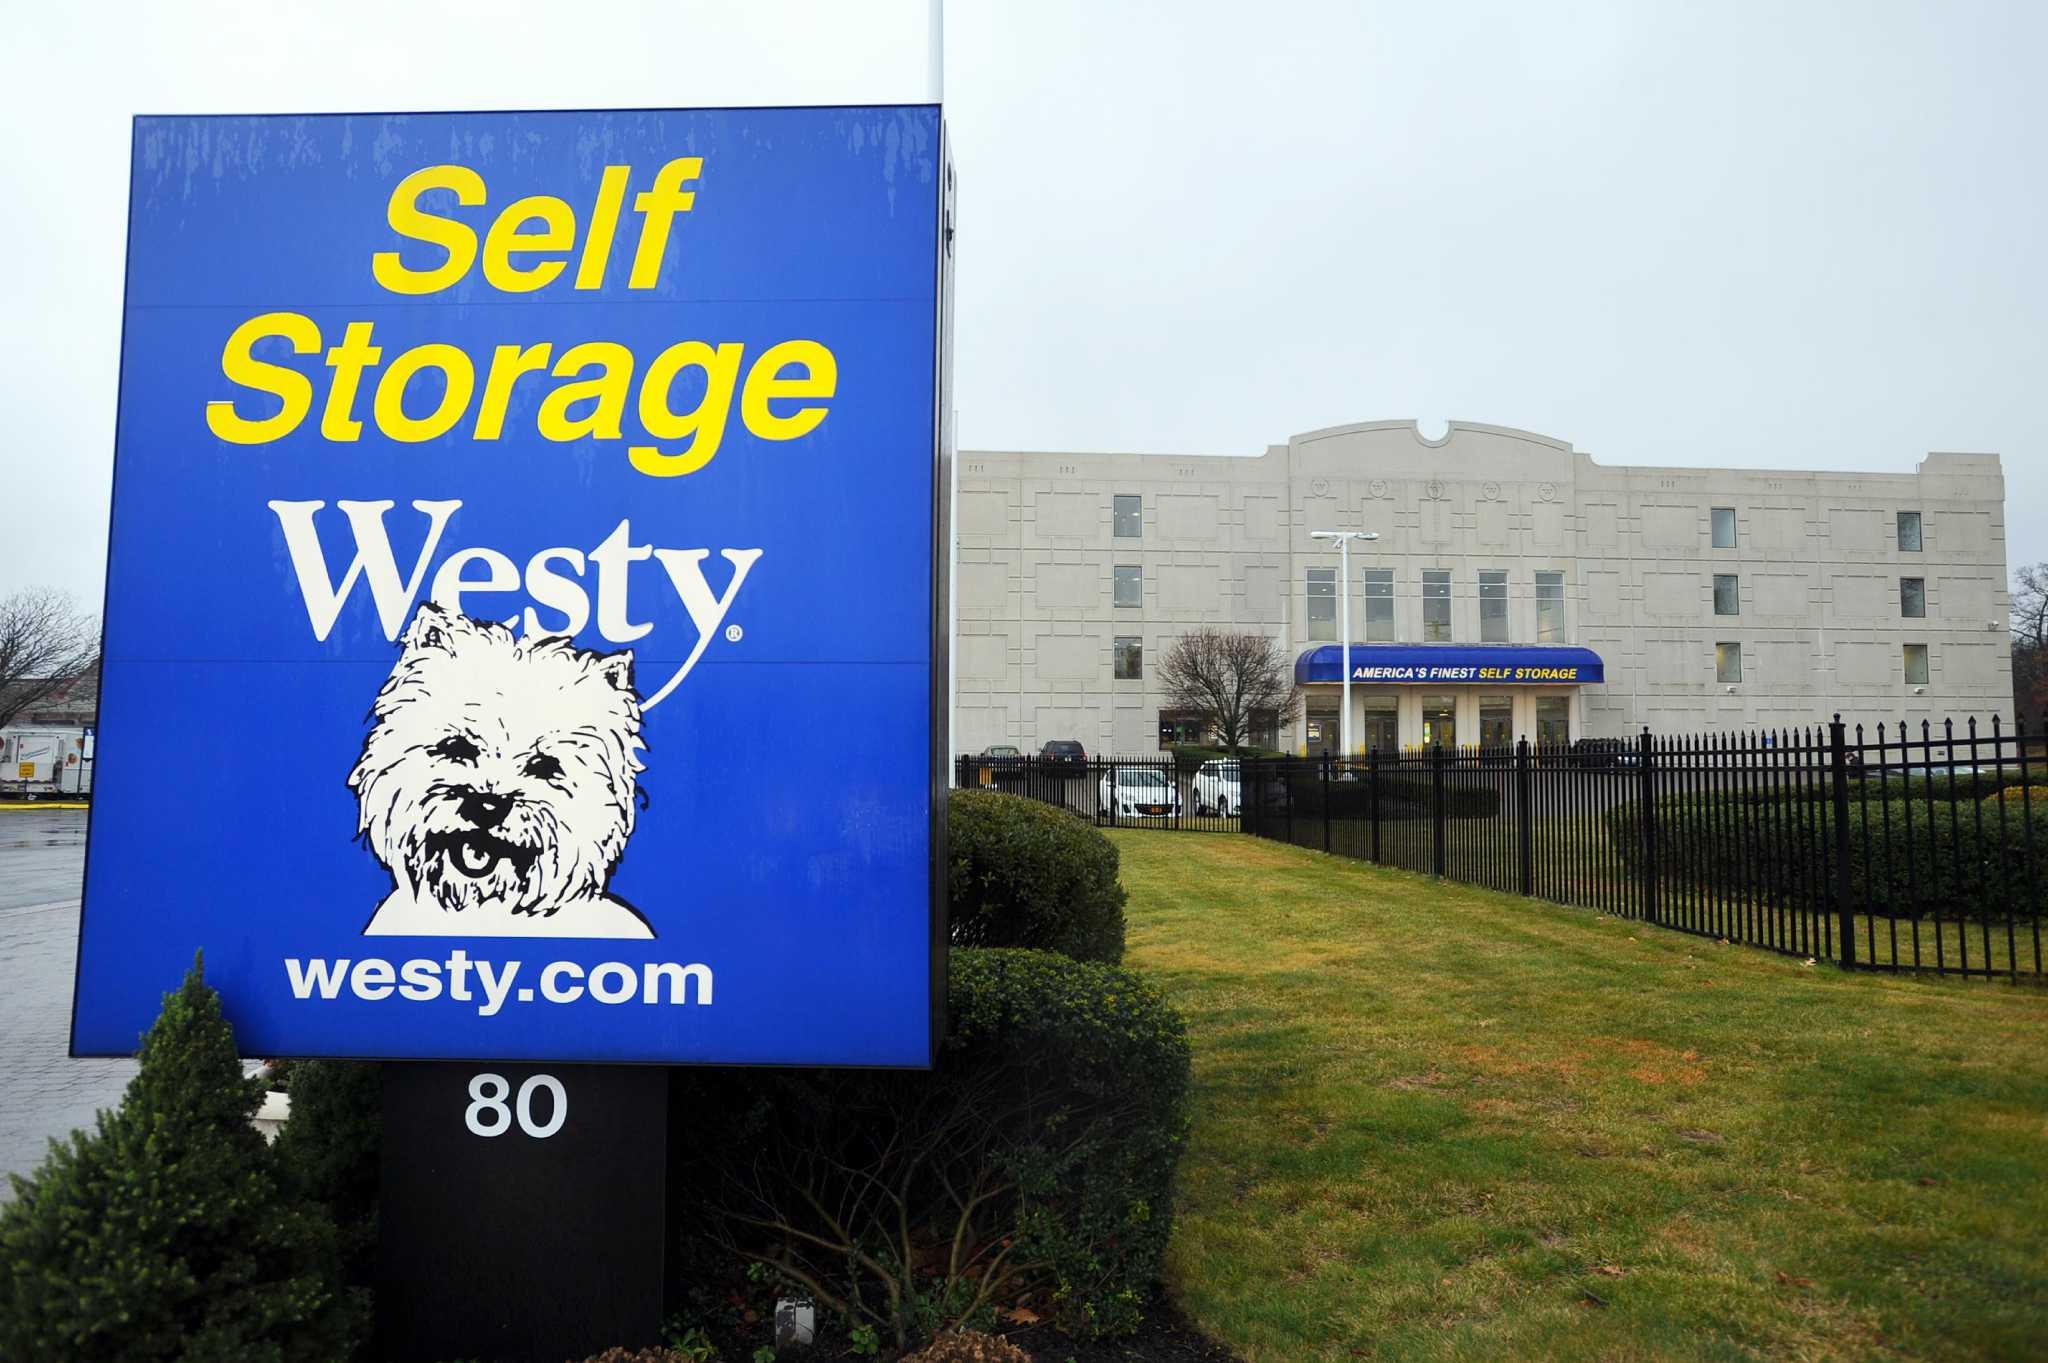 Genial Room To Grow: Westy Self Storage Center Plans Stamford Expansion    StamfordAdvocate